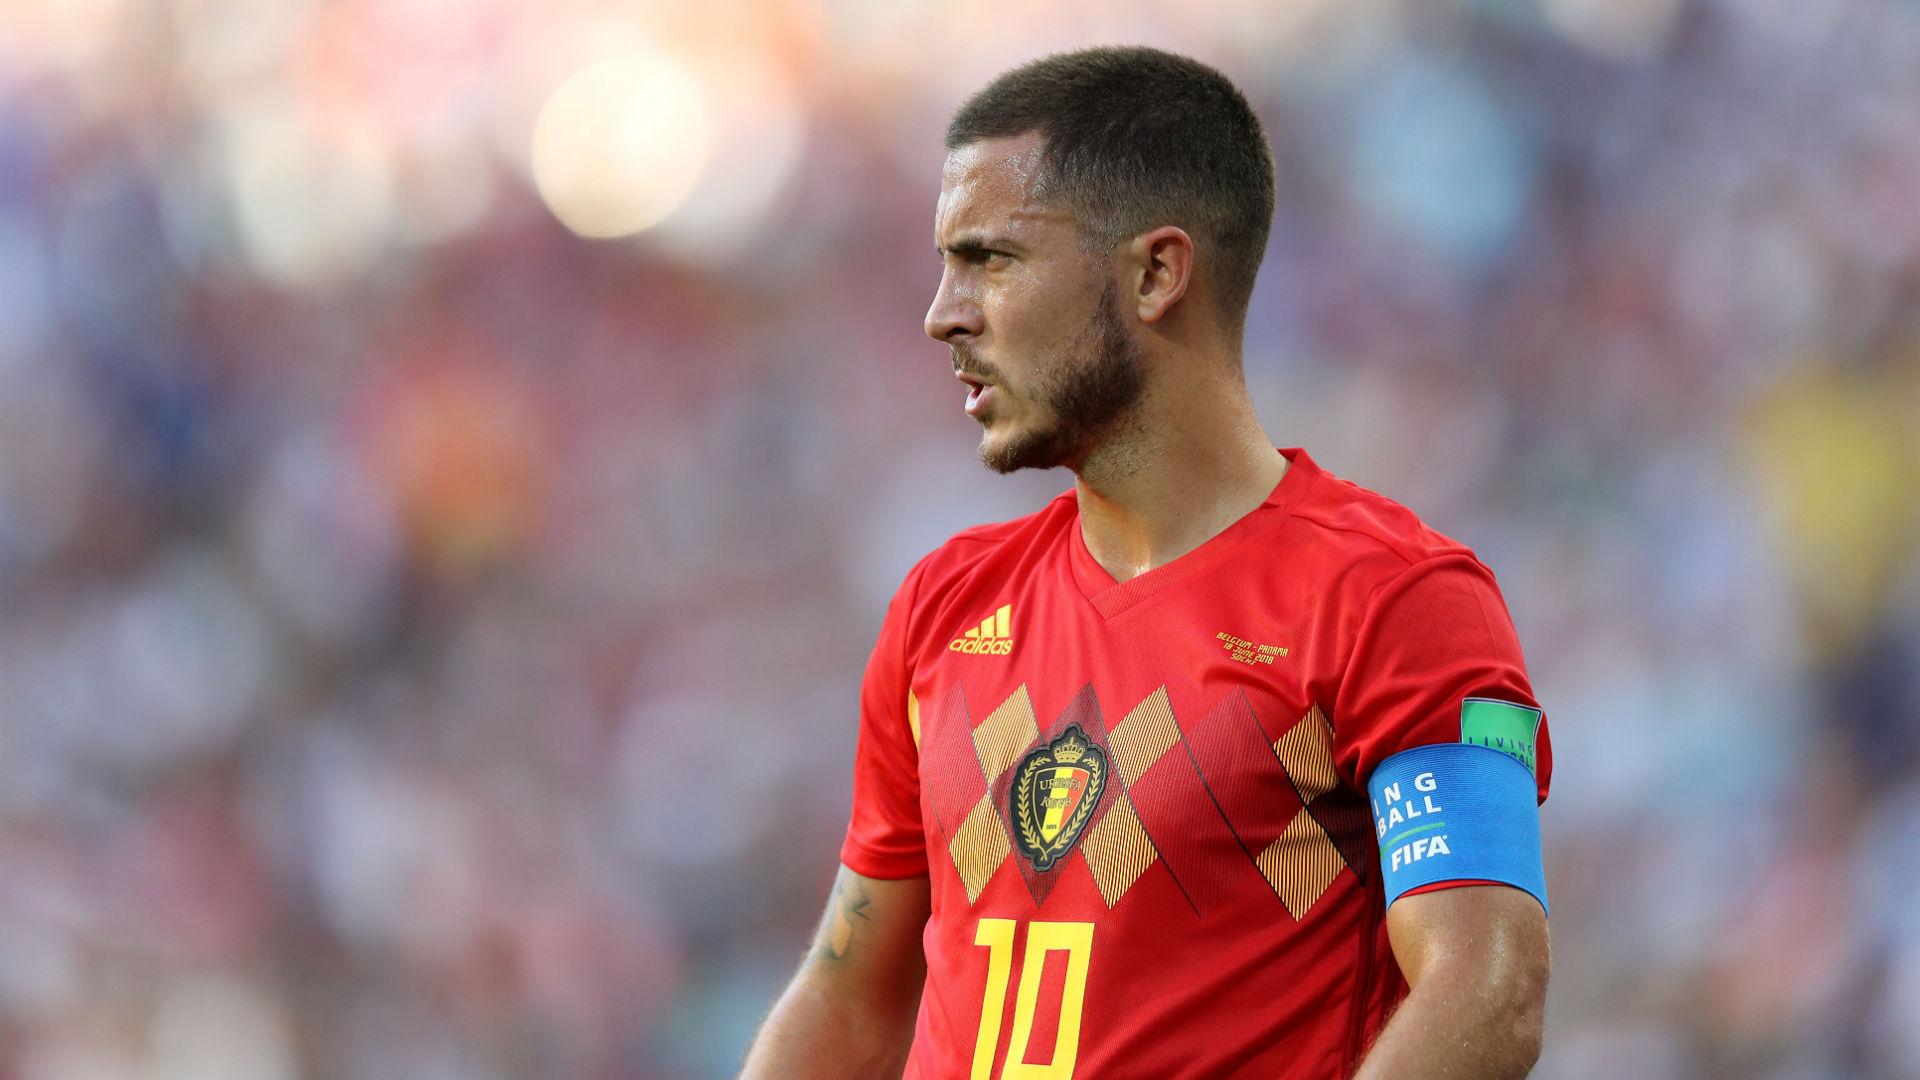 EURO 2020: Σε ποιους παίκτες θα είμαστε καρφωμένοι!